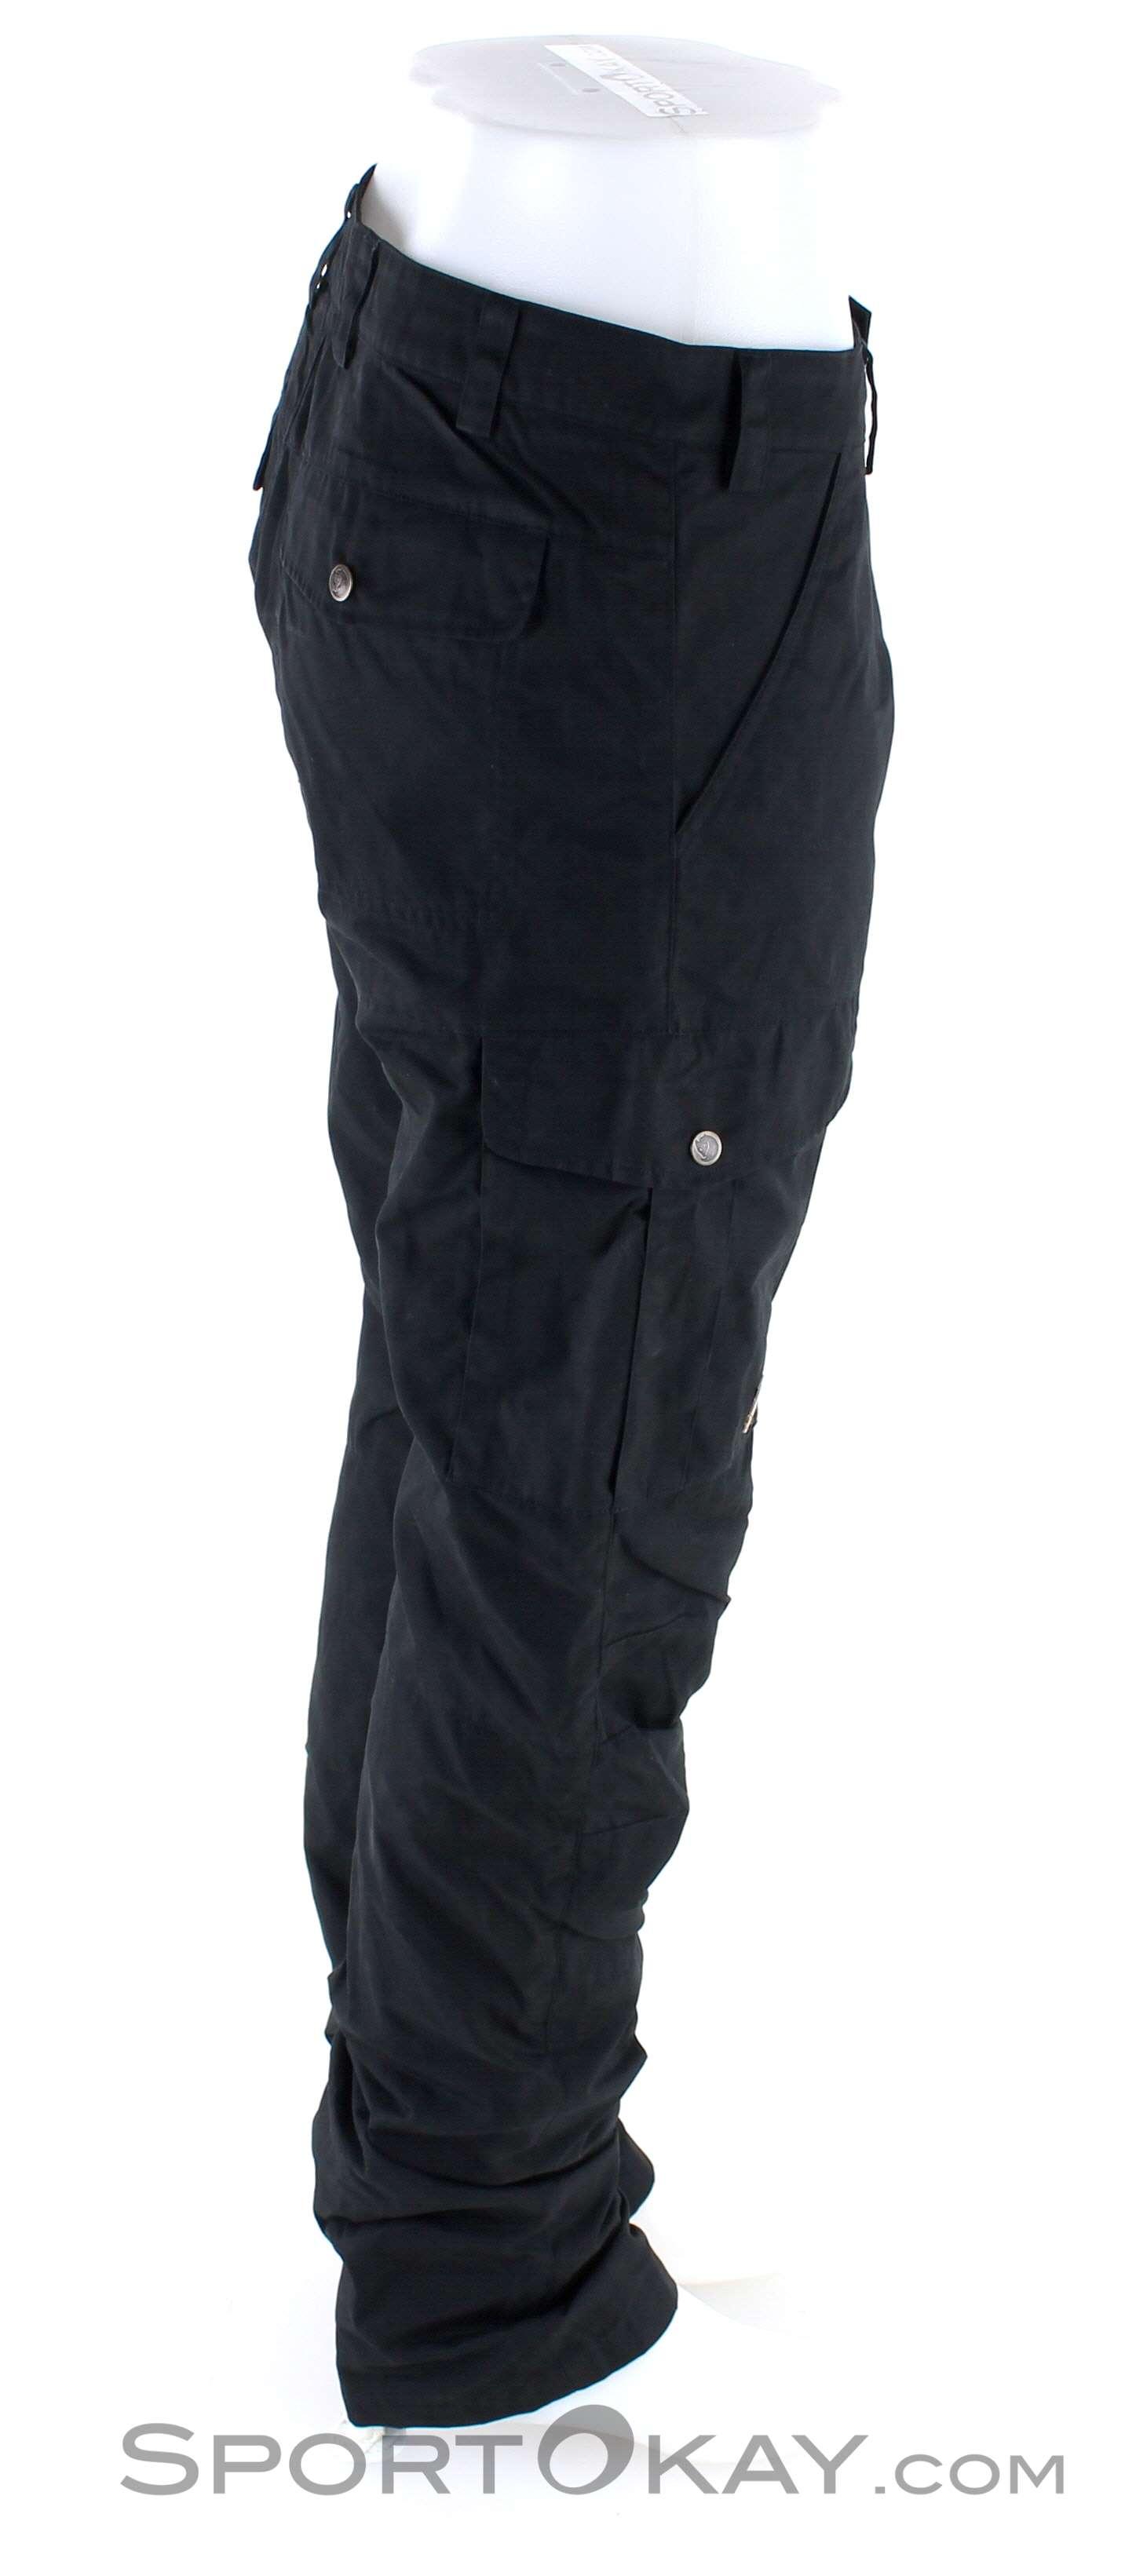 Herren Karl Pro Winter Hose dark grey 46